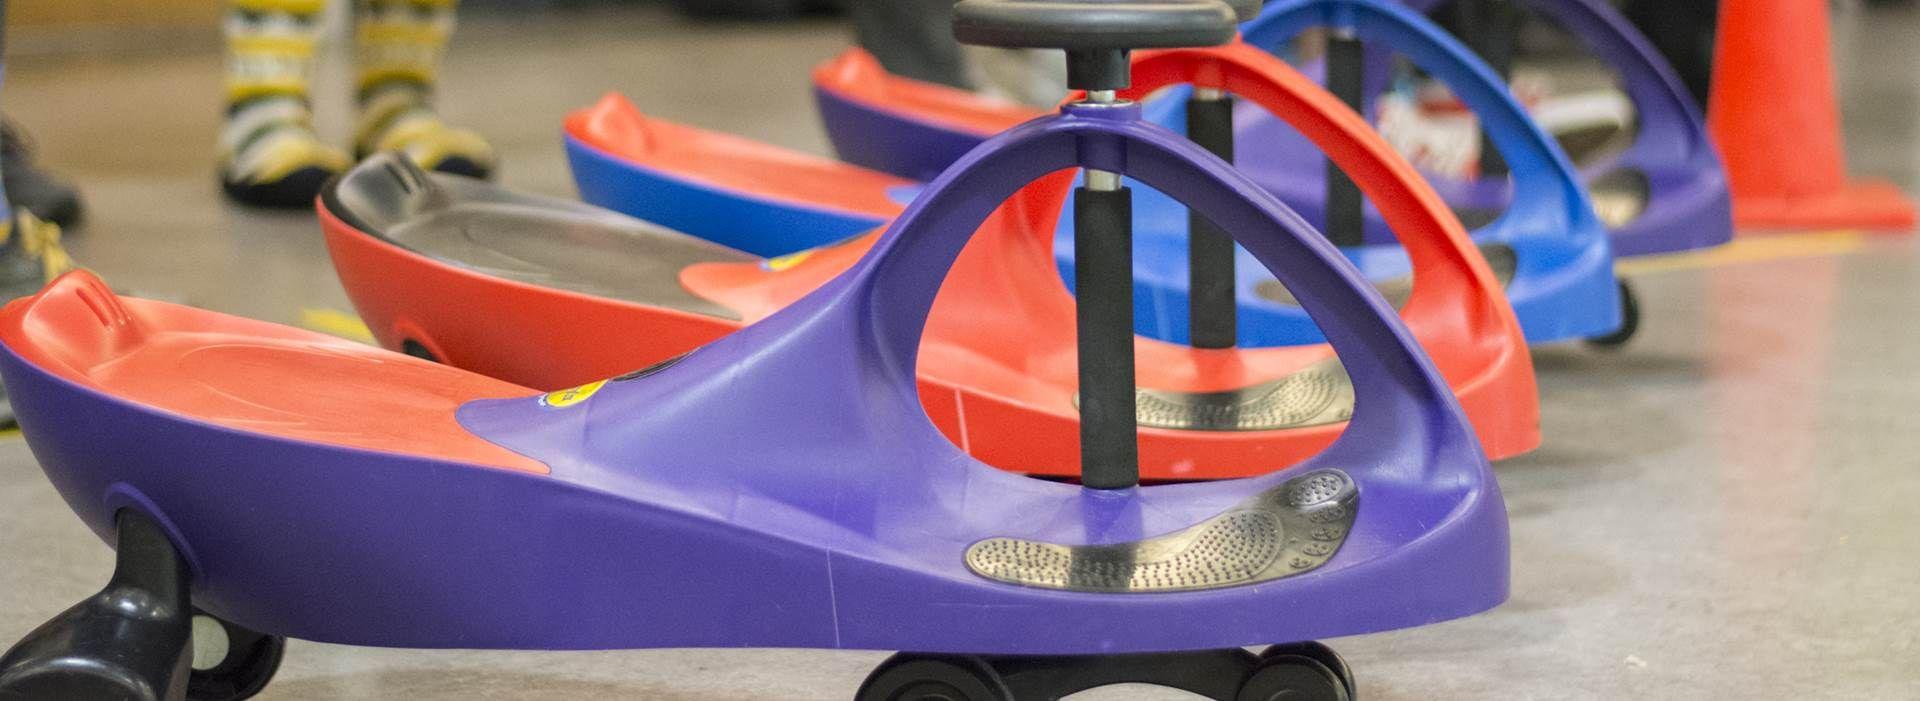 Circuito cars: Servicios de Animación sociocultural Nydia